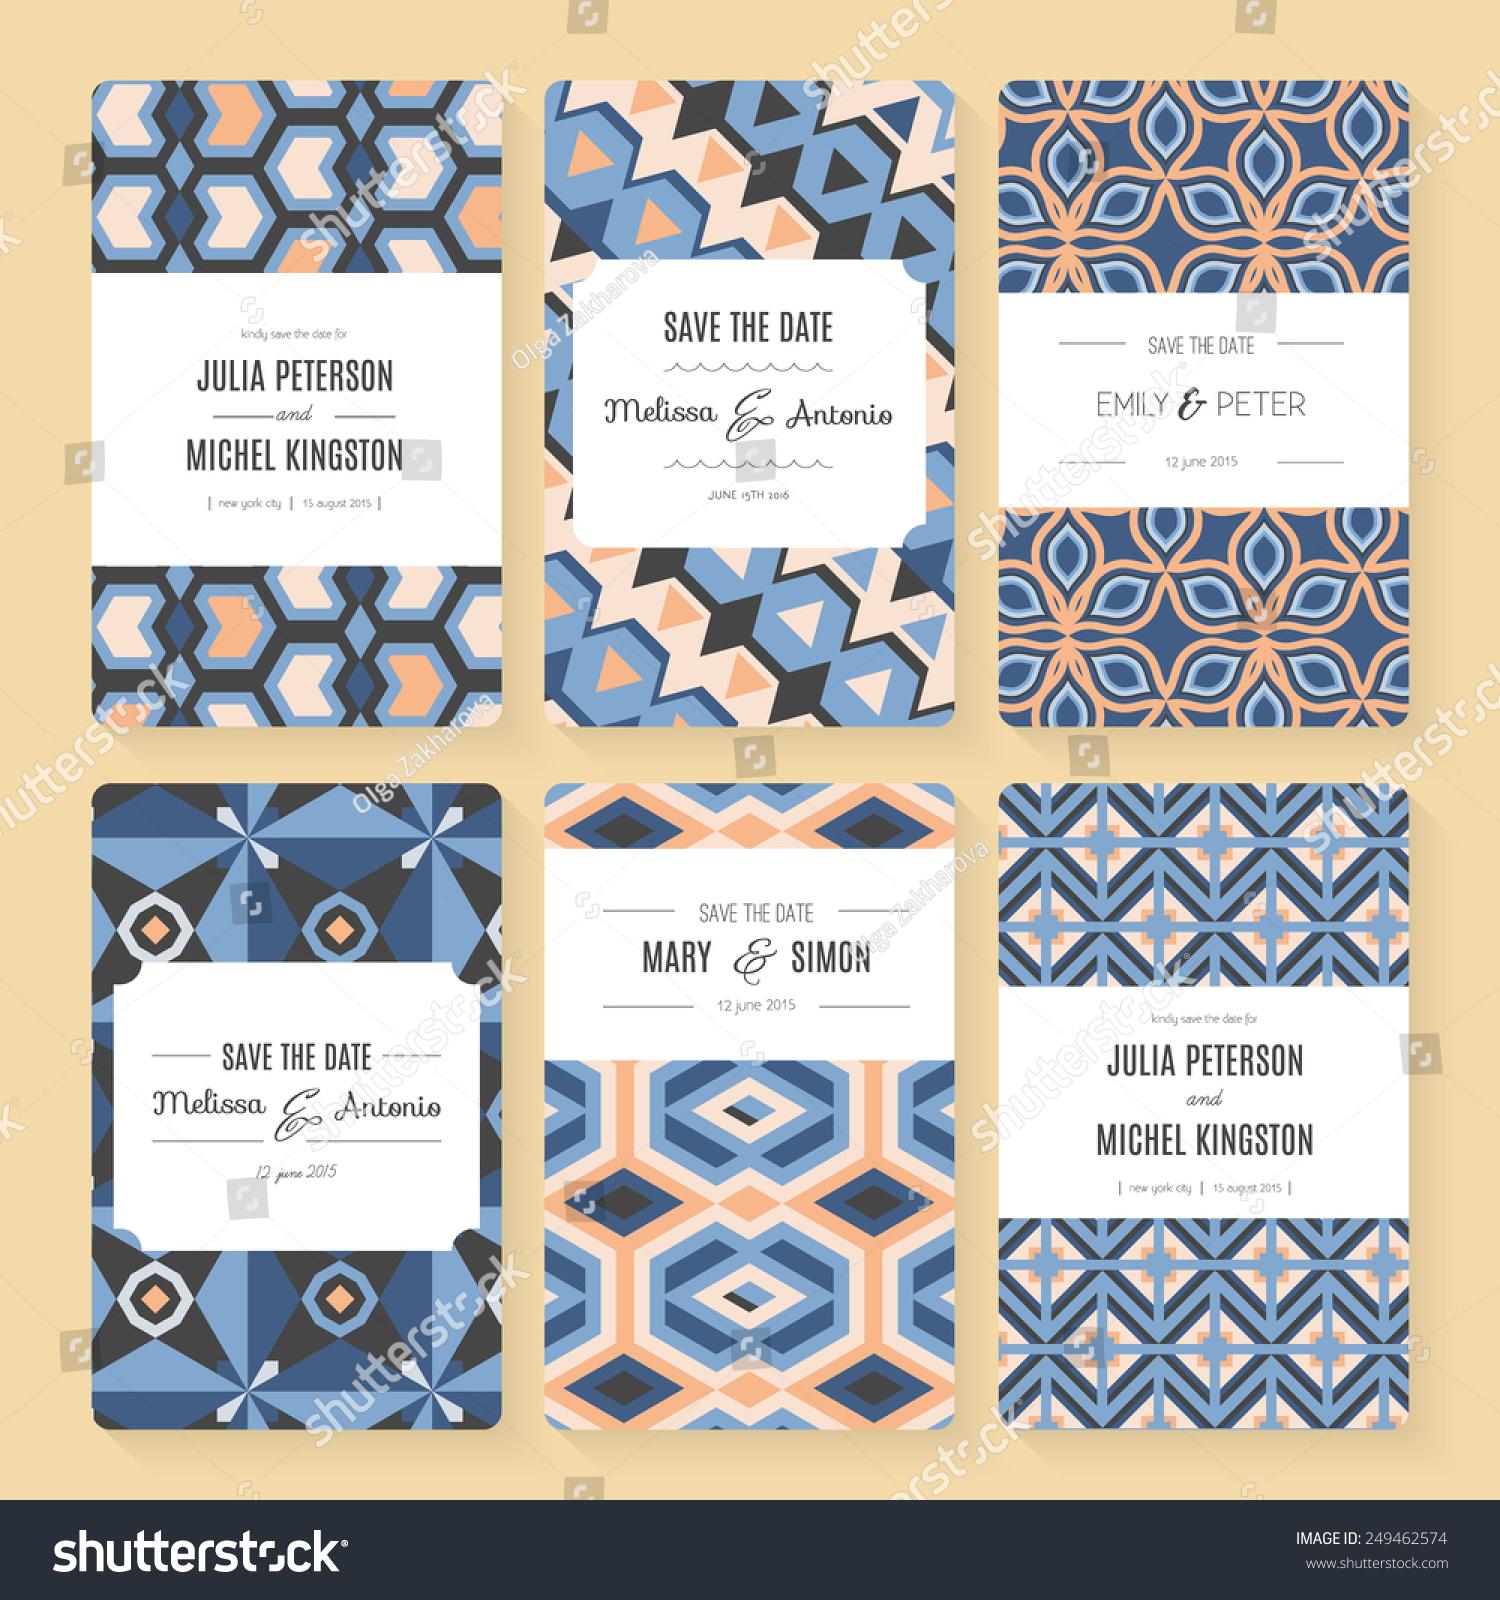 Stylish Save Date Wedding Invitation Card Stock Photo (Photo, Vector ...